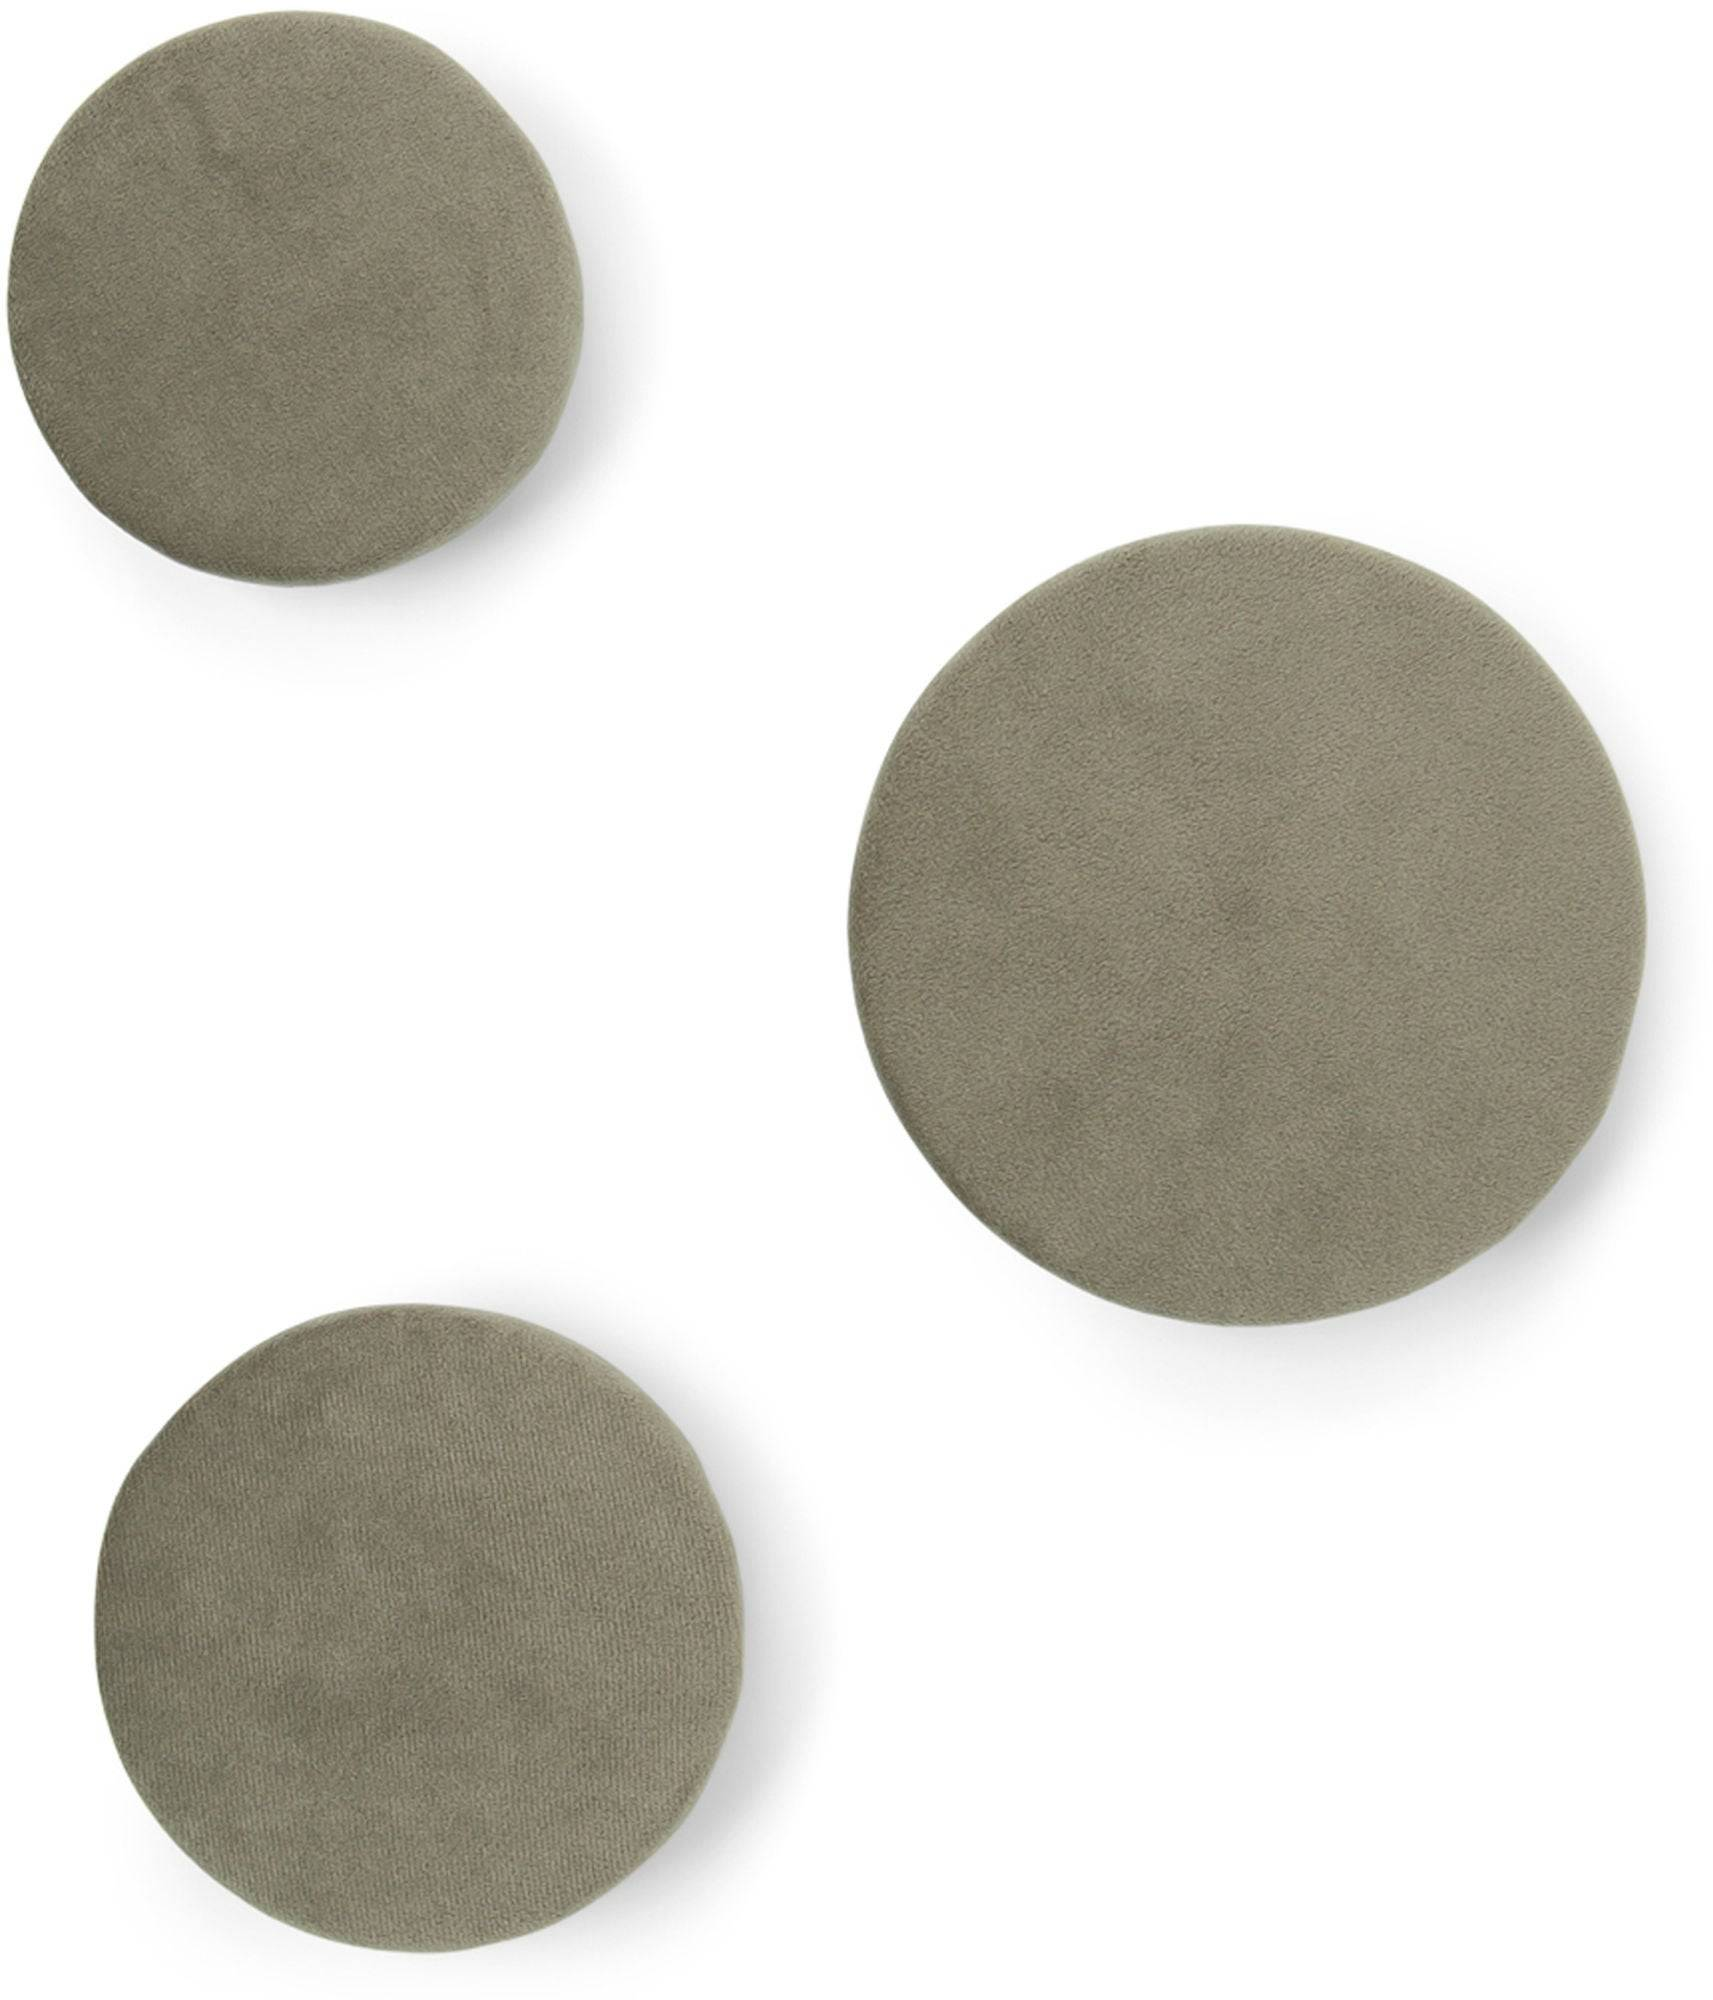 That's Mine Knagg Soft Hooks , Grey/Sandstone